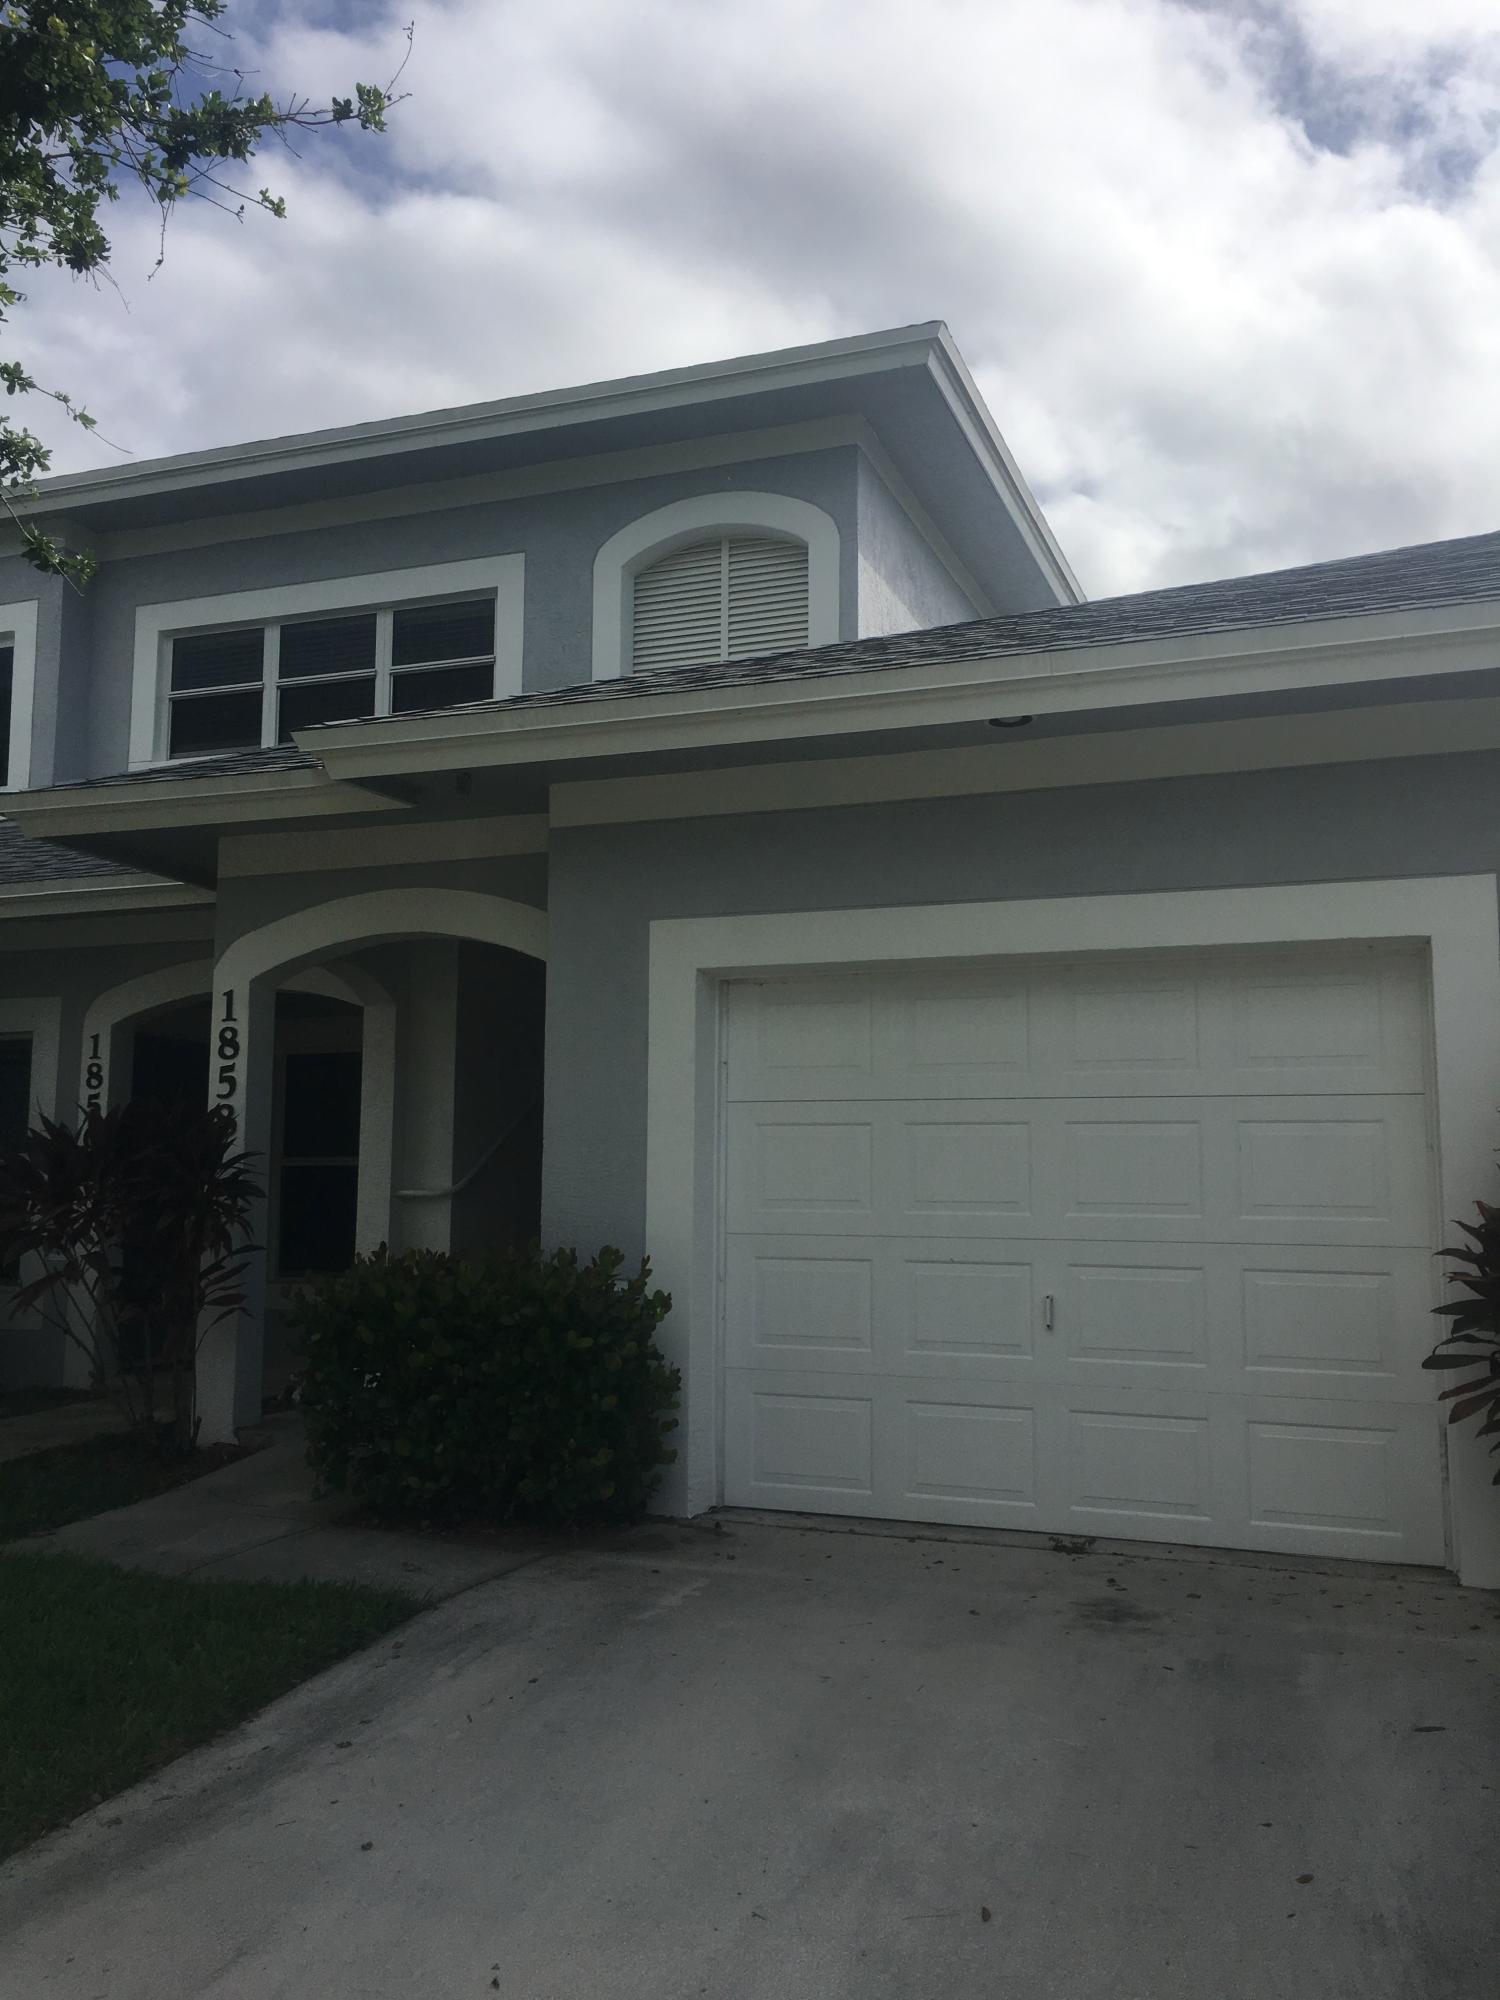 Co-op / Condo للـ Sale في 1858 E Sanderling Lane 1858 E Sanderling Lane Fort Pierce, Florida 34982 United States